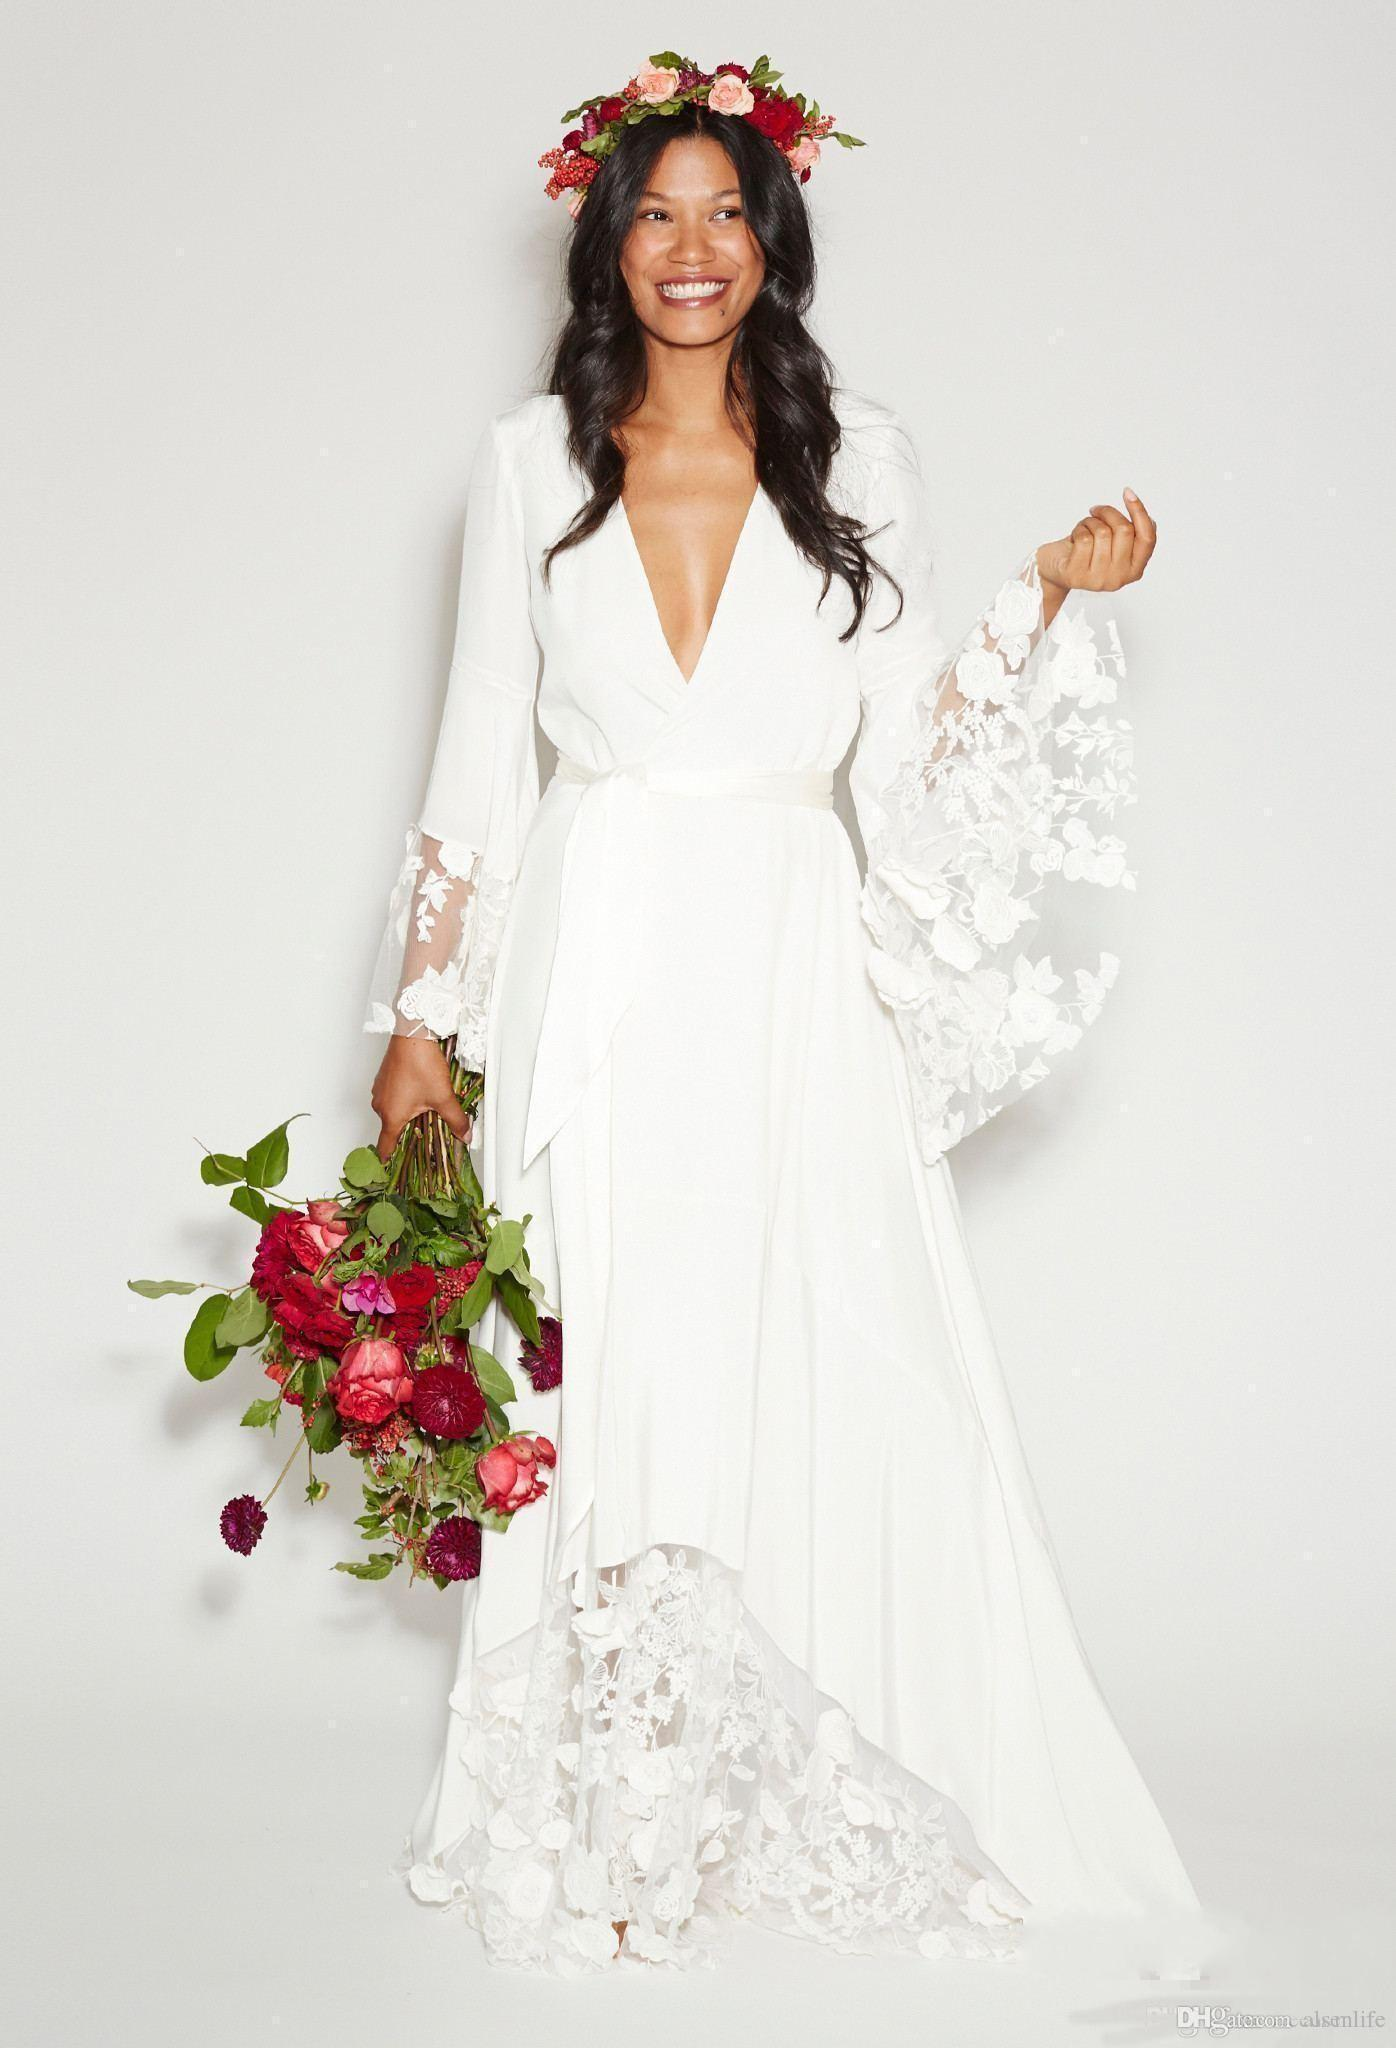 2017 Boho Praia Vestidos De Noiva Boêmio Longo Sino Manga Lace Flor De Noiva Vestidos Plus Size Vestido De Casamento Hippie